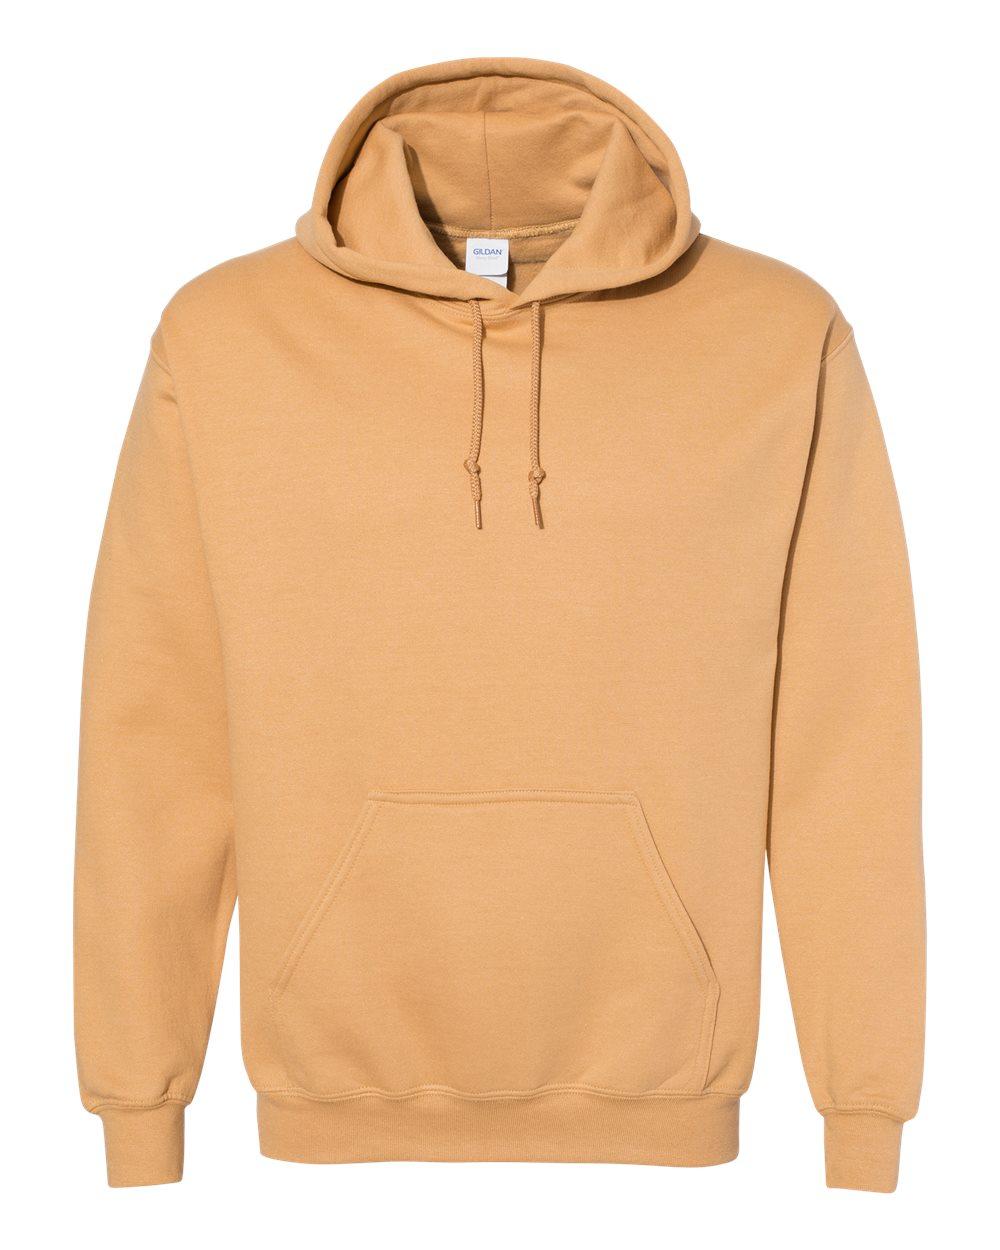 Gildan-Mens-Blank-Hoodie-Heavy-Blend-Hooded-Sweatshirt-Solid-18500-up-to-5XL thumbnail 68